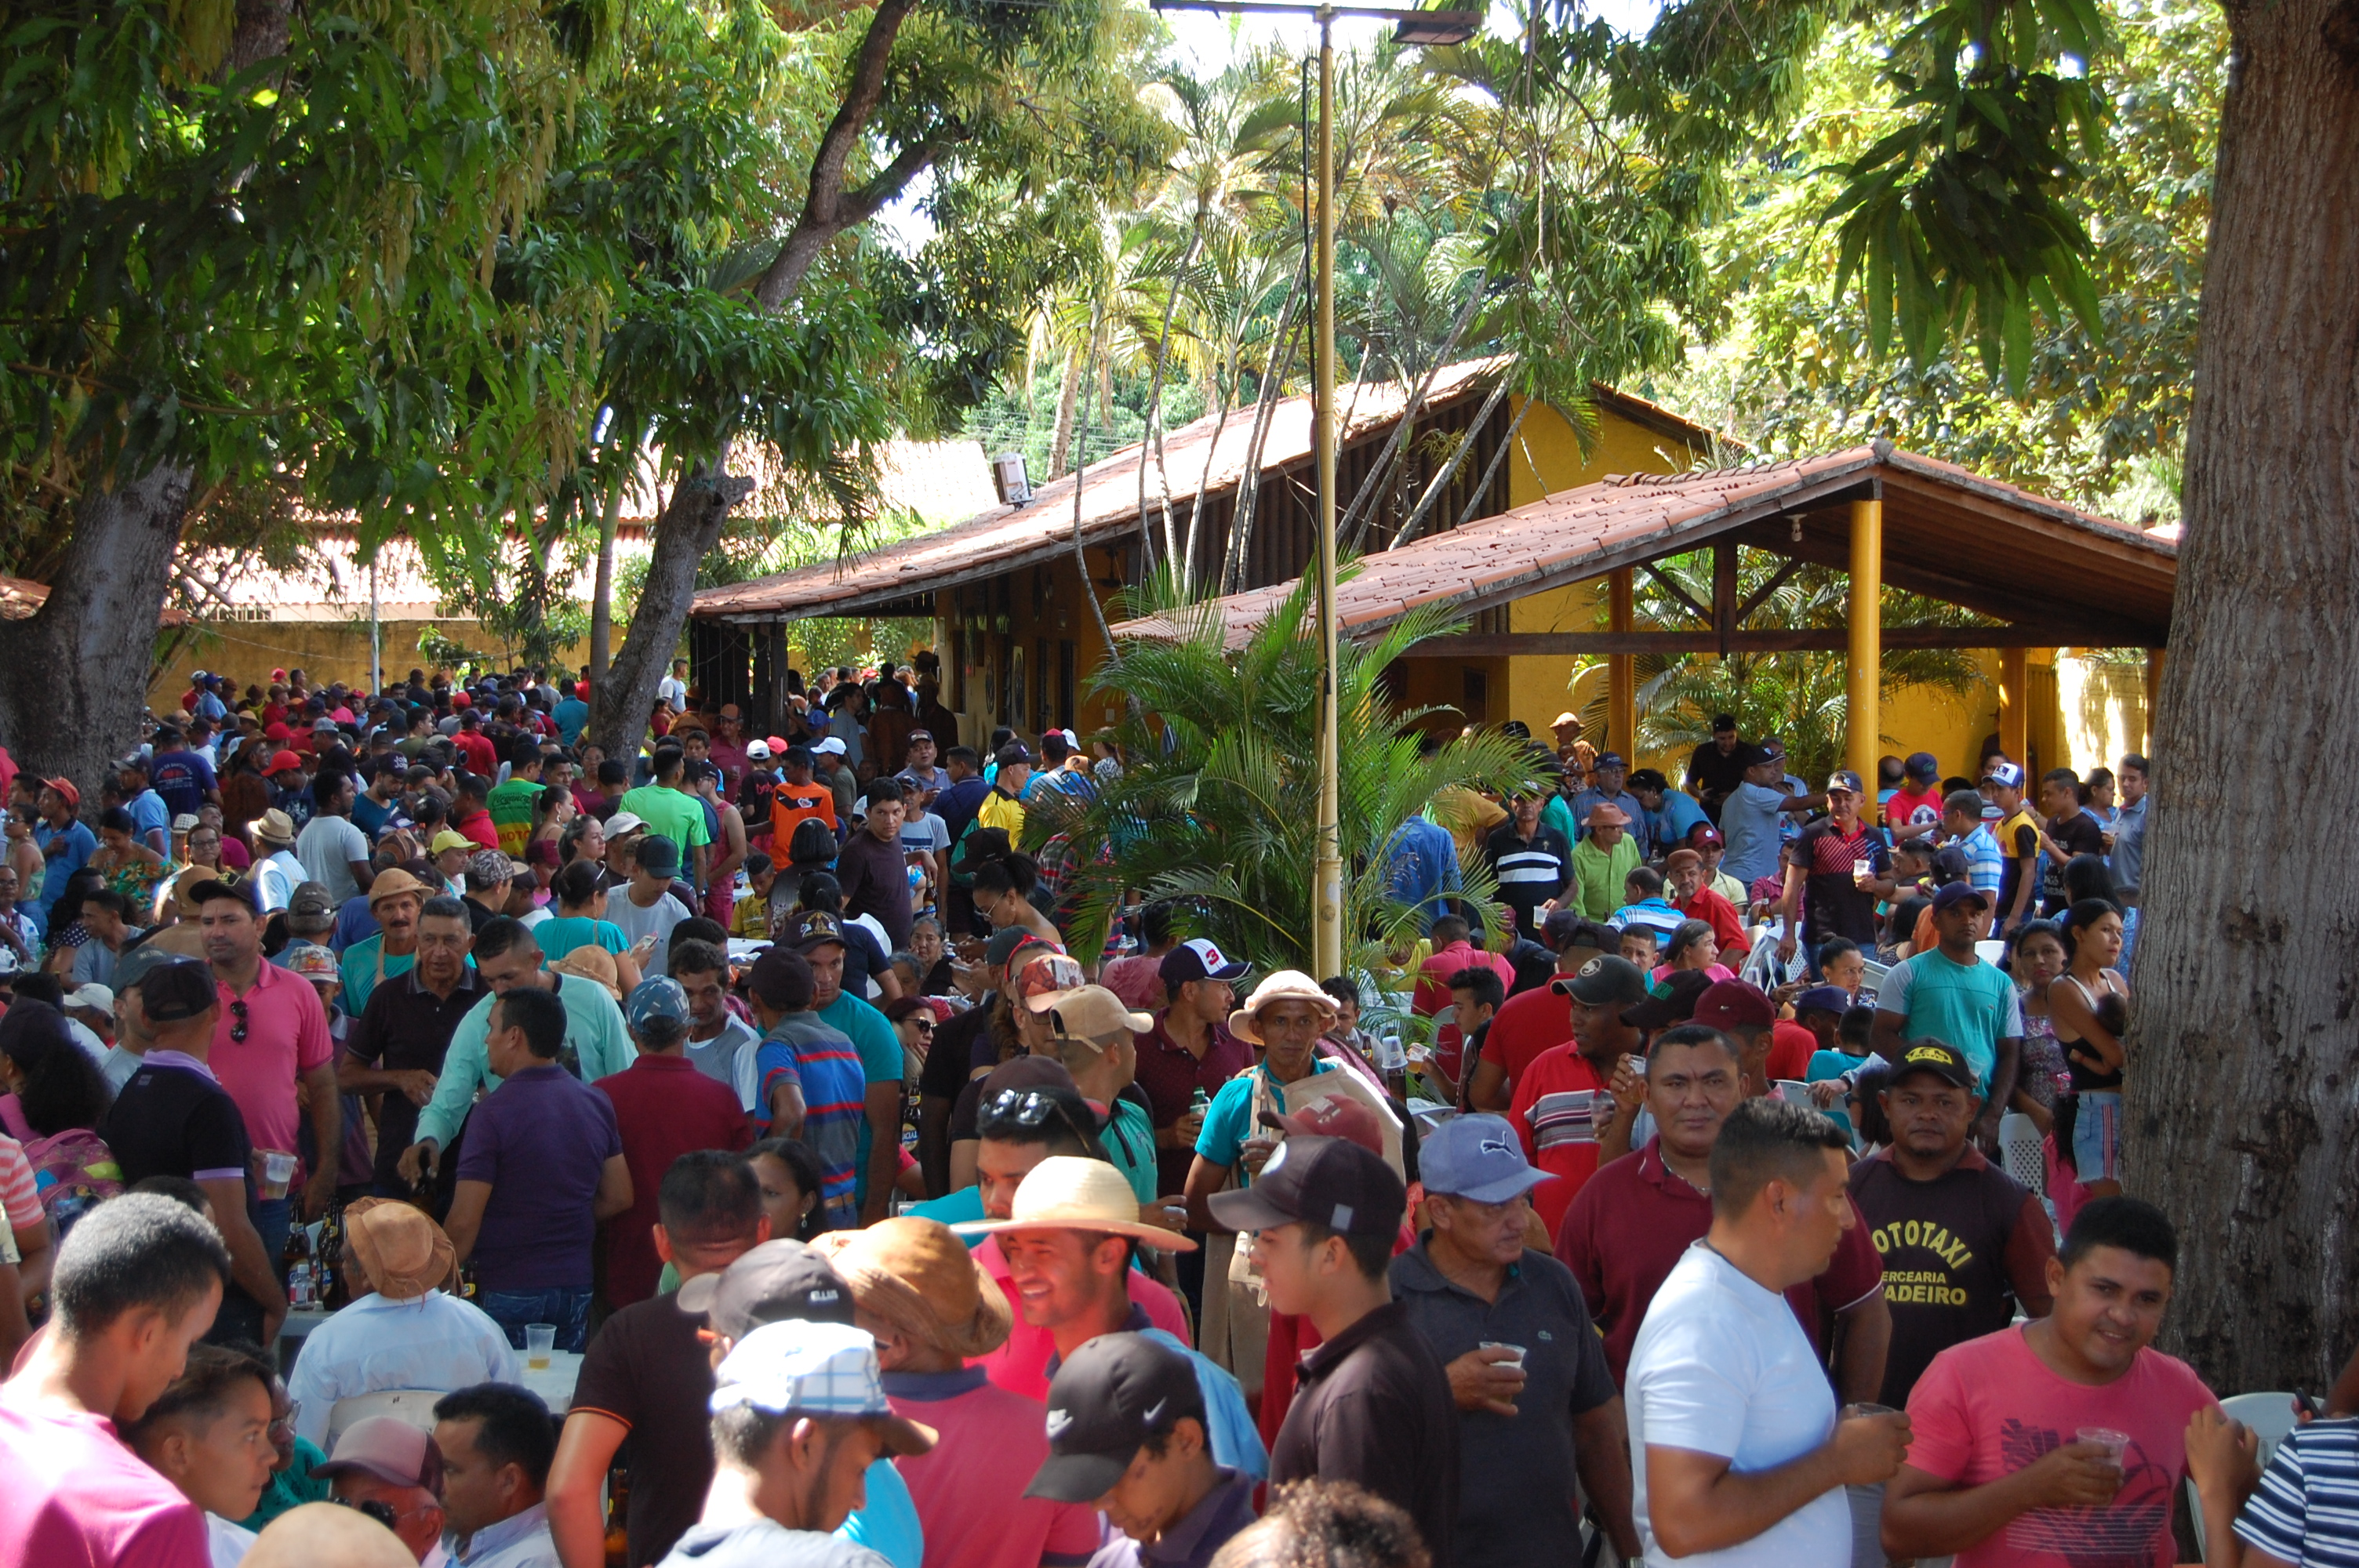 Tradicional festa do vaqueiro é realizada na residência do ex-prefeito de José de Freitas Robert Freitas